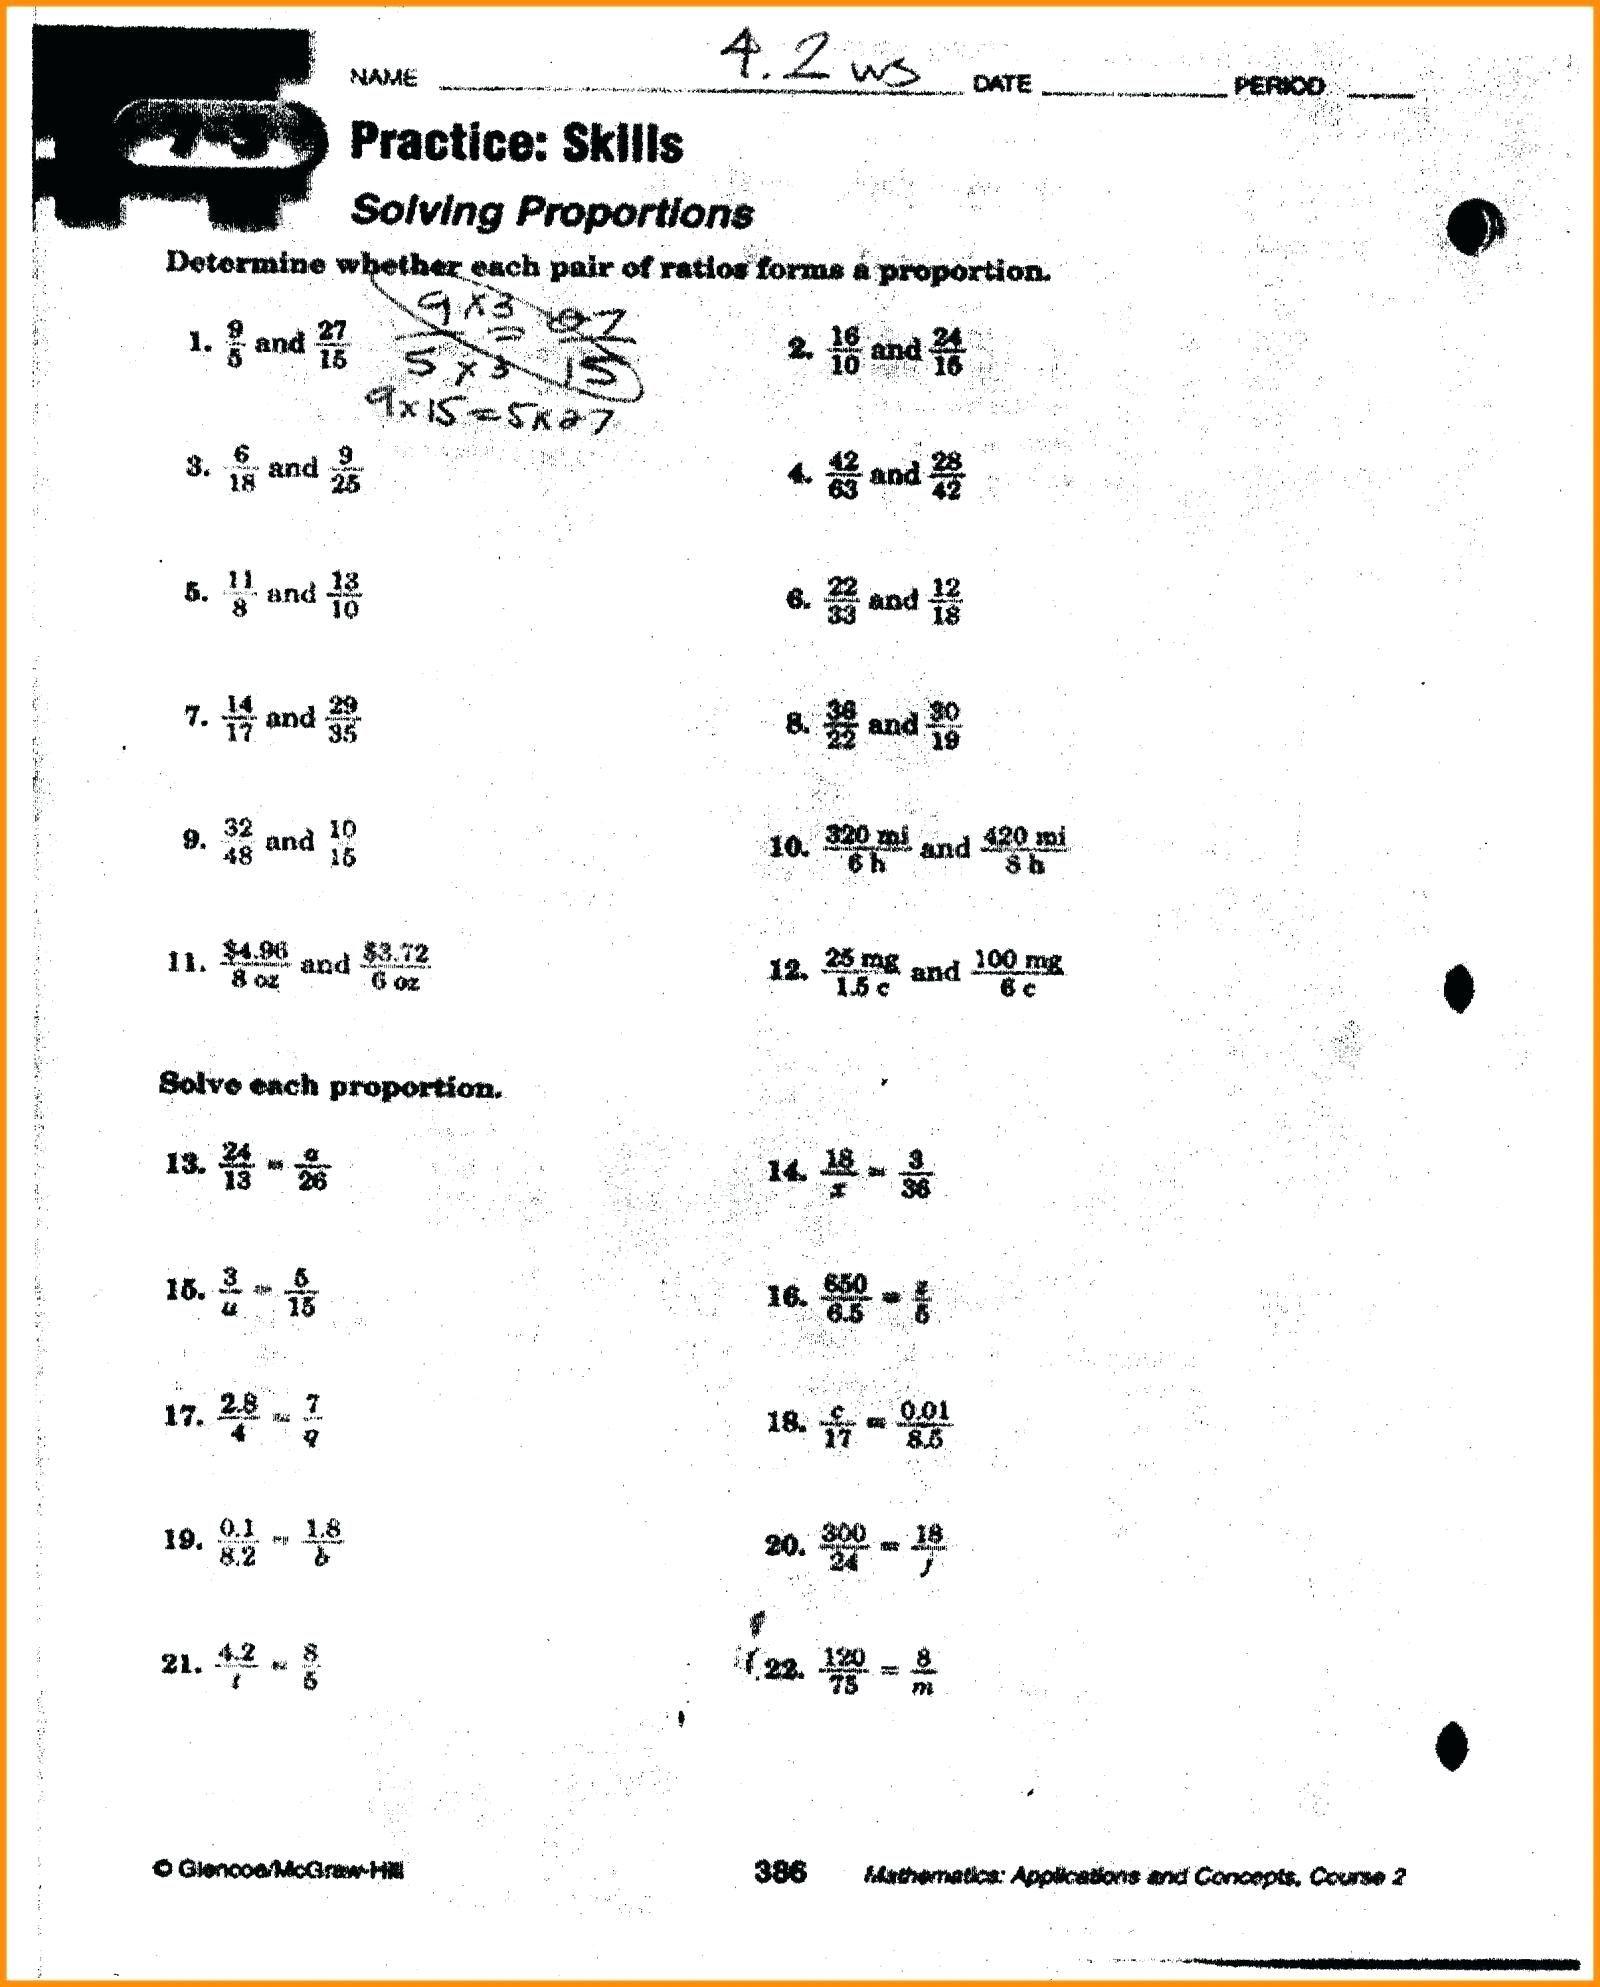 41 Simple Ratio Worksheets Design Math worksheets, Ratio